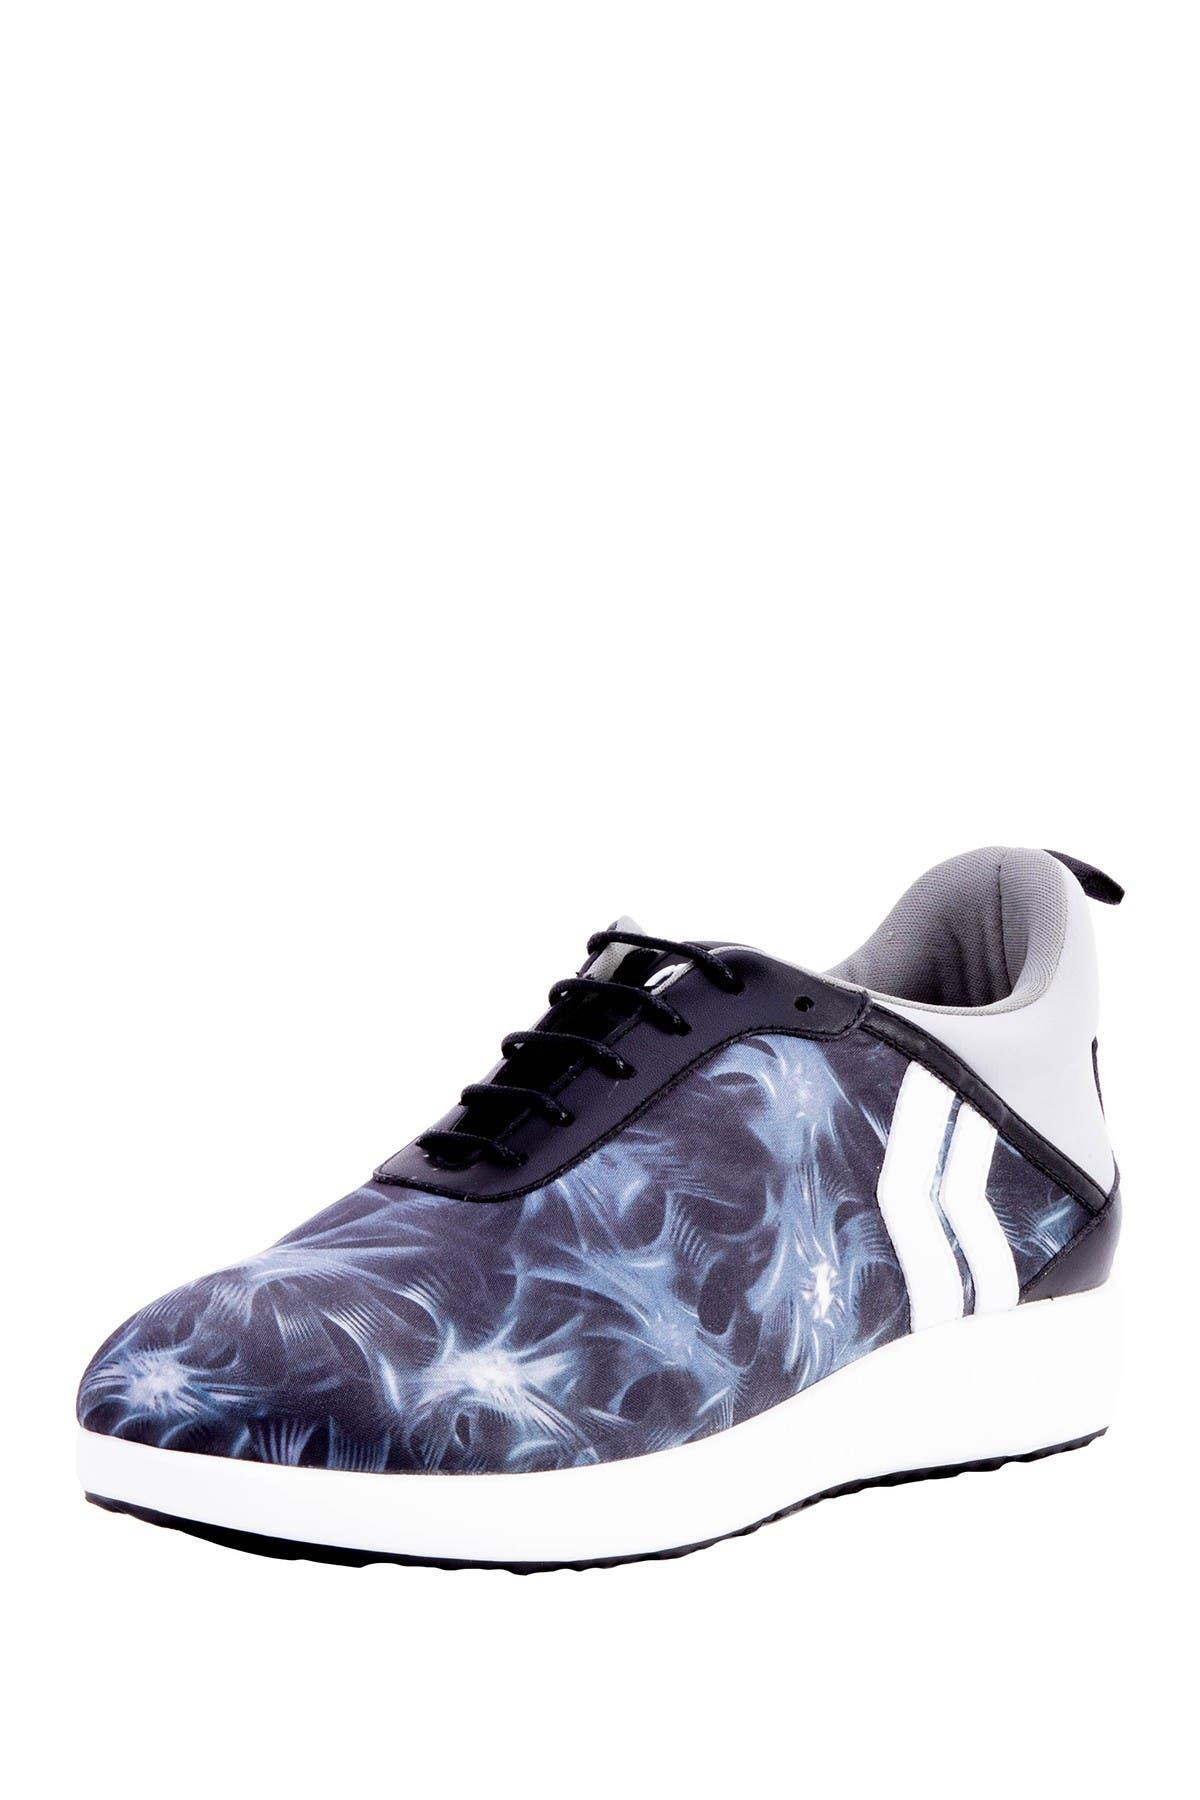 Image of KICKO Cosmos Sneaker